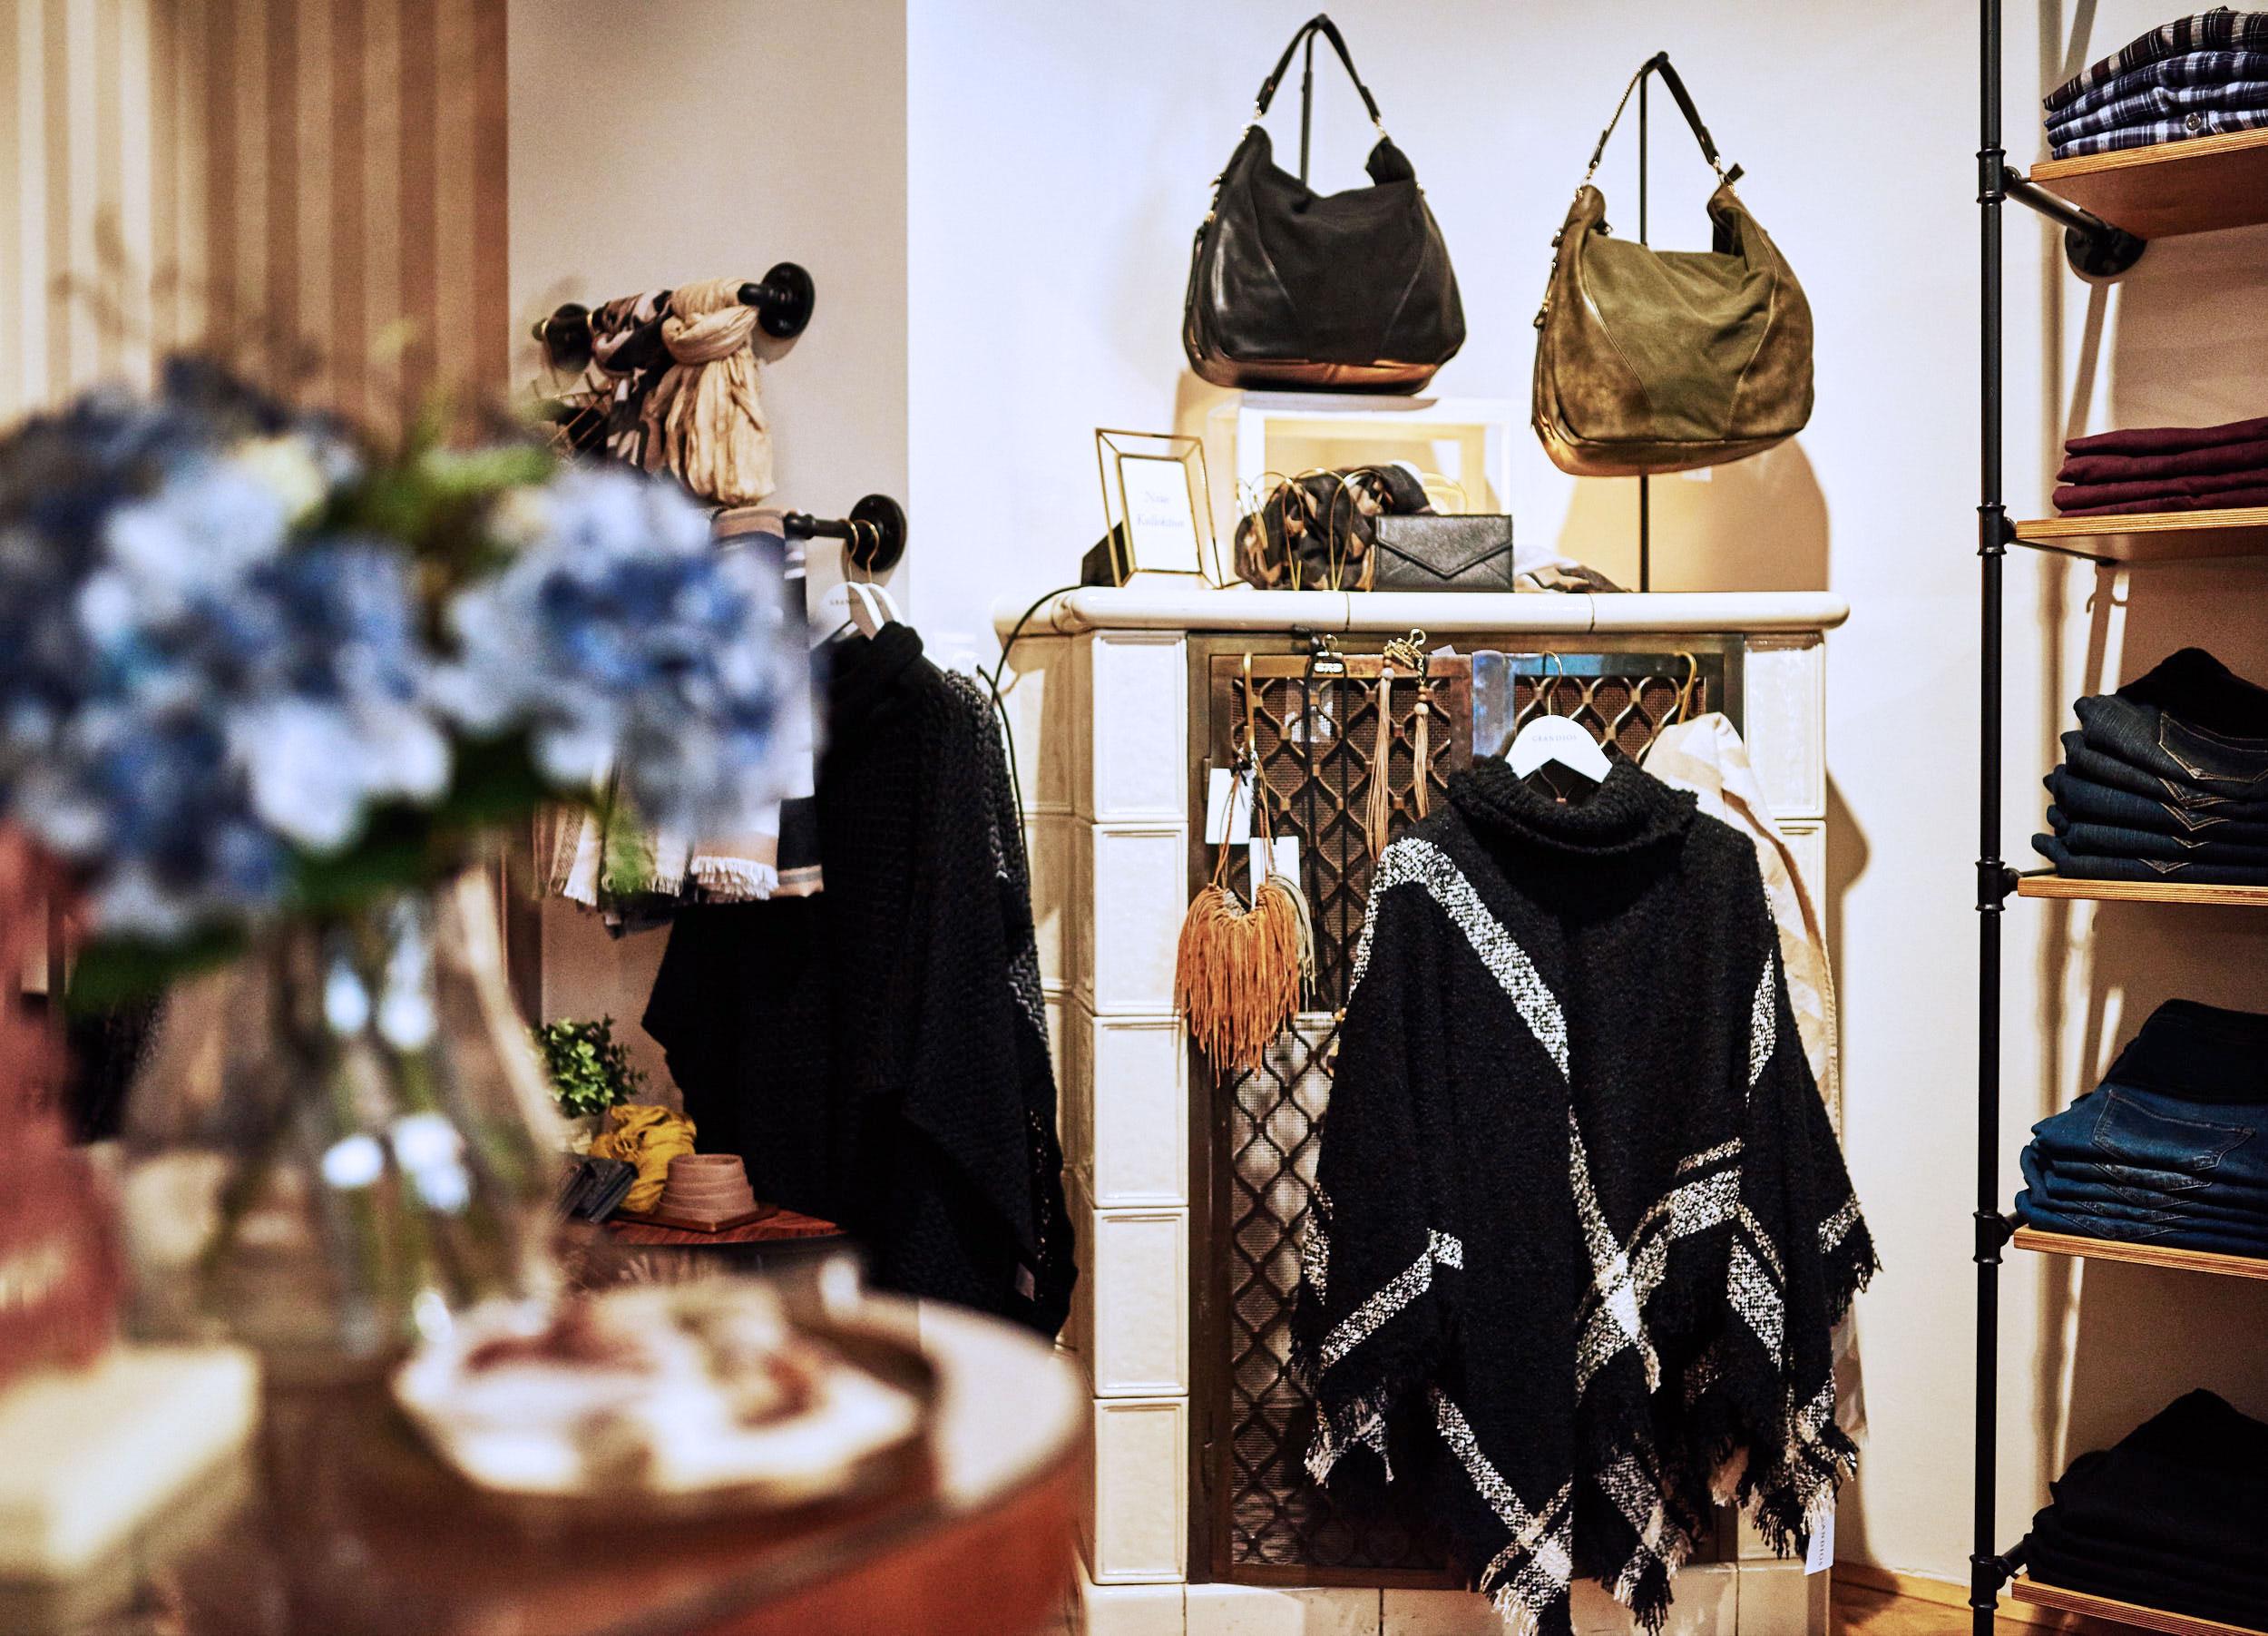 boutique-grandios-vienna-otto-bauer-gasse-11-wien-mariahilferstrase-kardiaserena-plus-size-fashion-outfit-accessoires